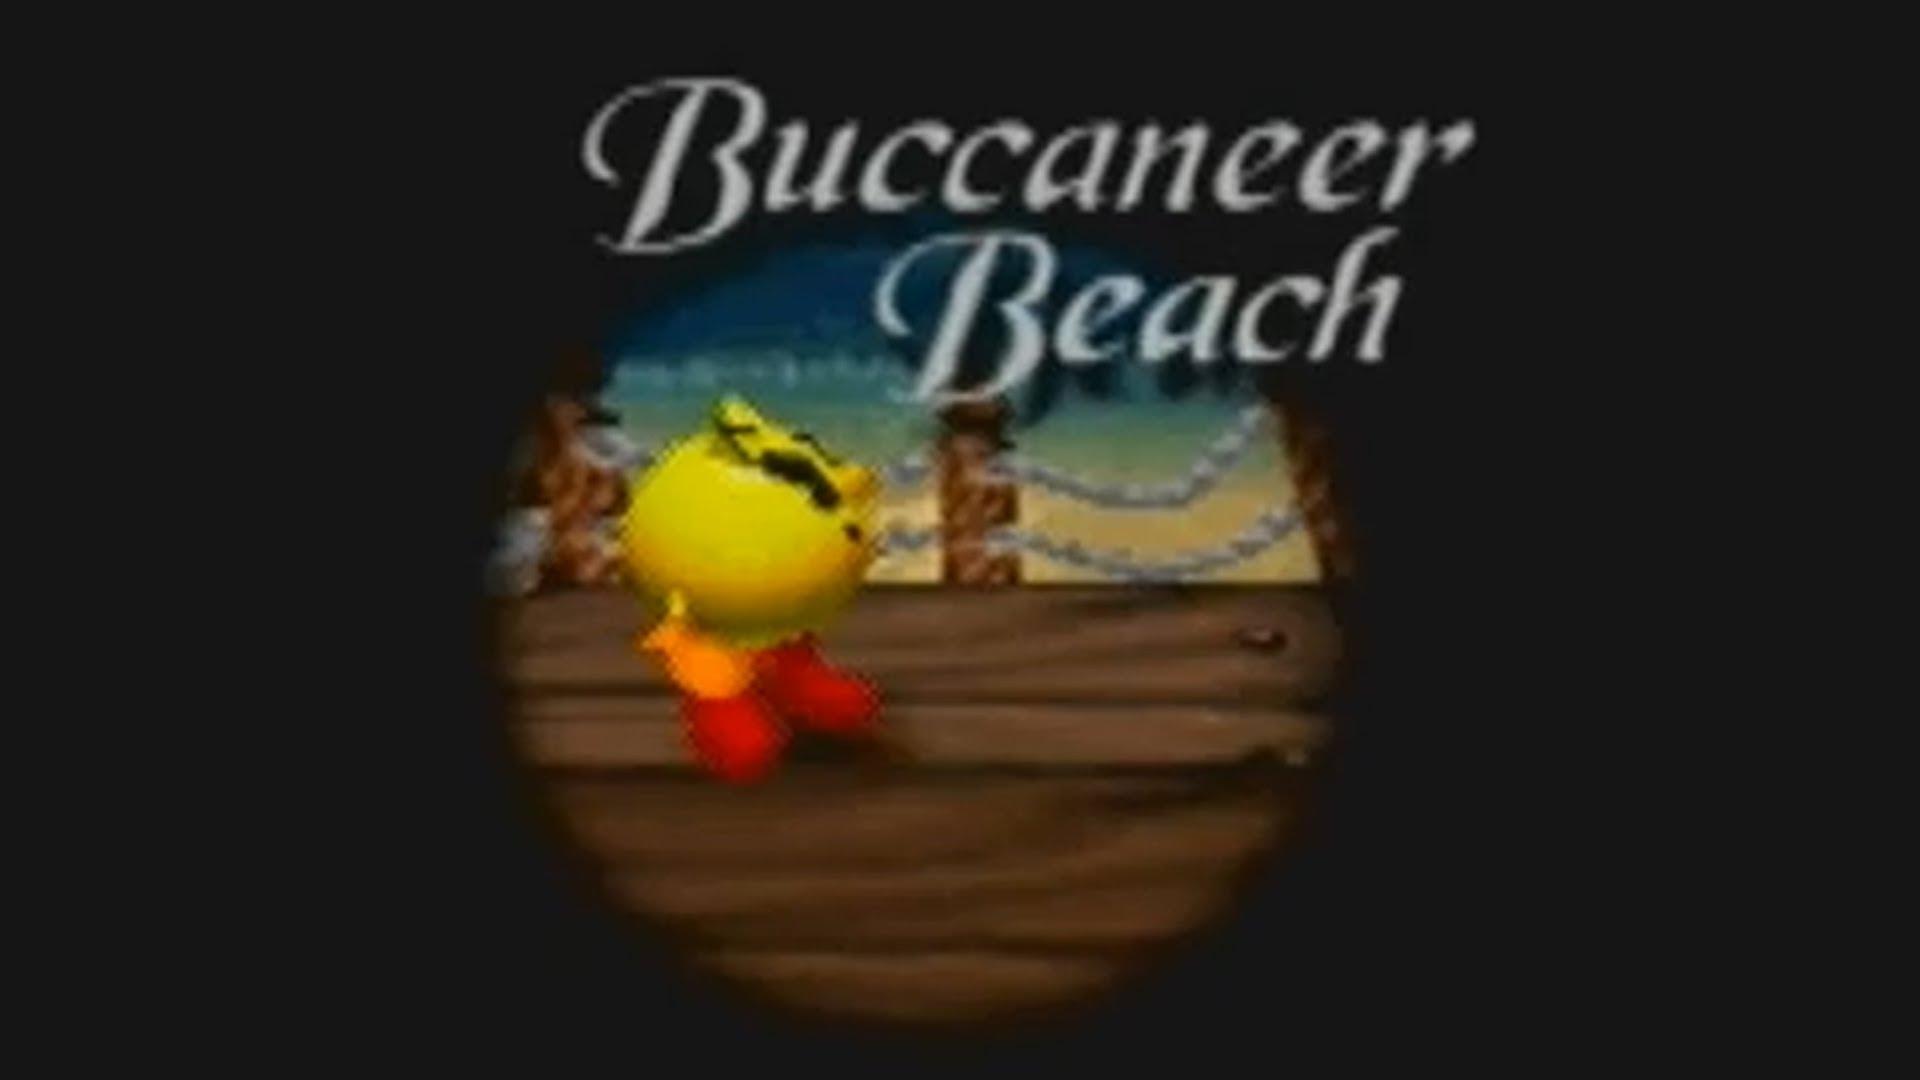 Amazing VGM: Buccaneer Beach (Pac-Man World)